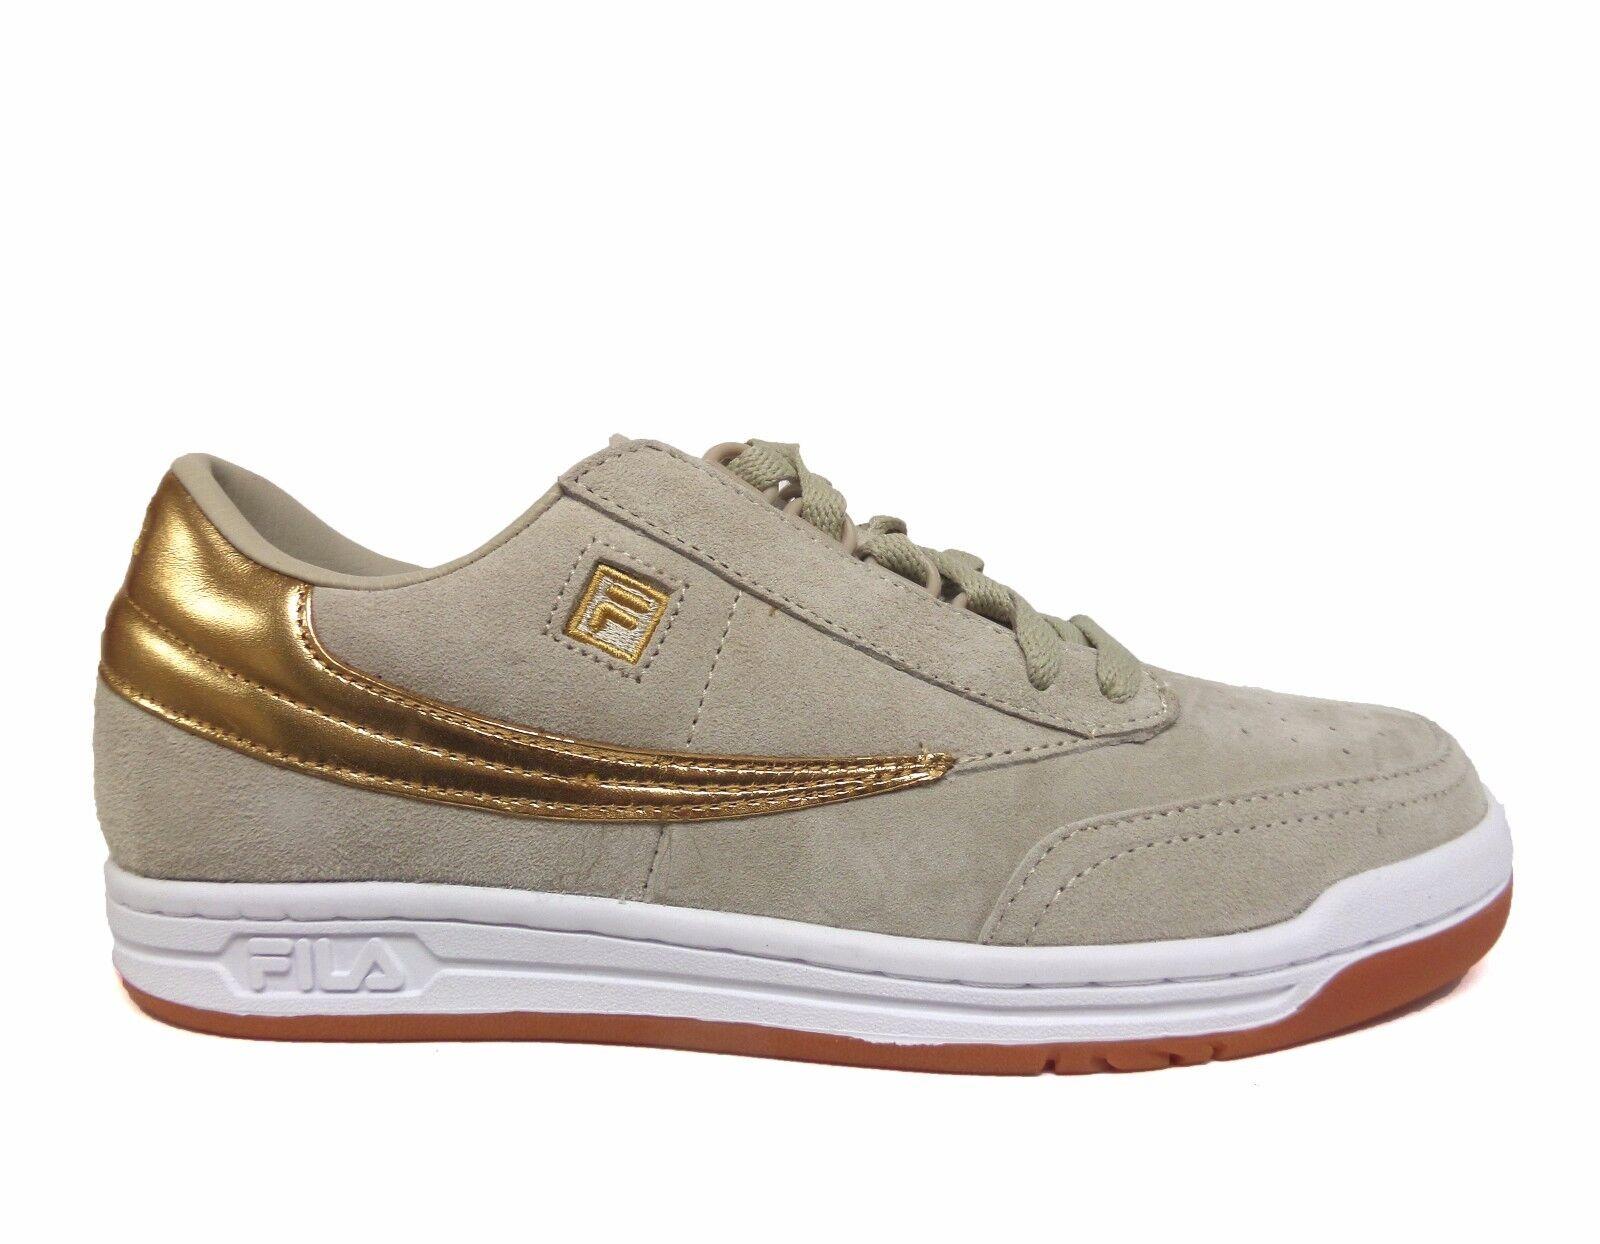 FILA Men's GOLD MINE ORIGINAL TENNIS Shoes Cream/Gold 1VT13058-926 b best-selling model of the brand